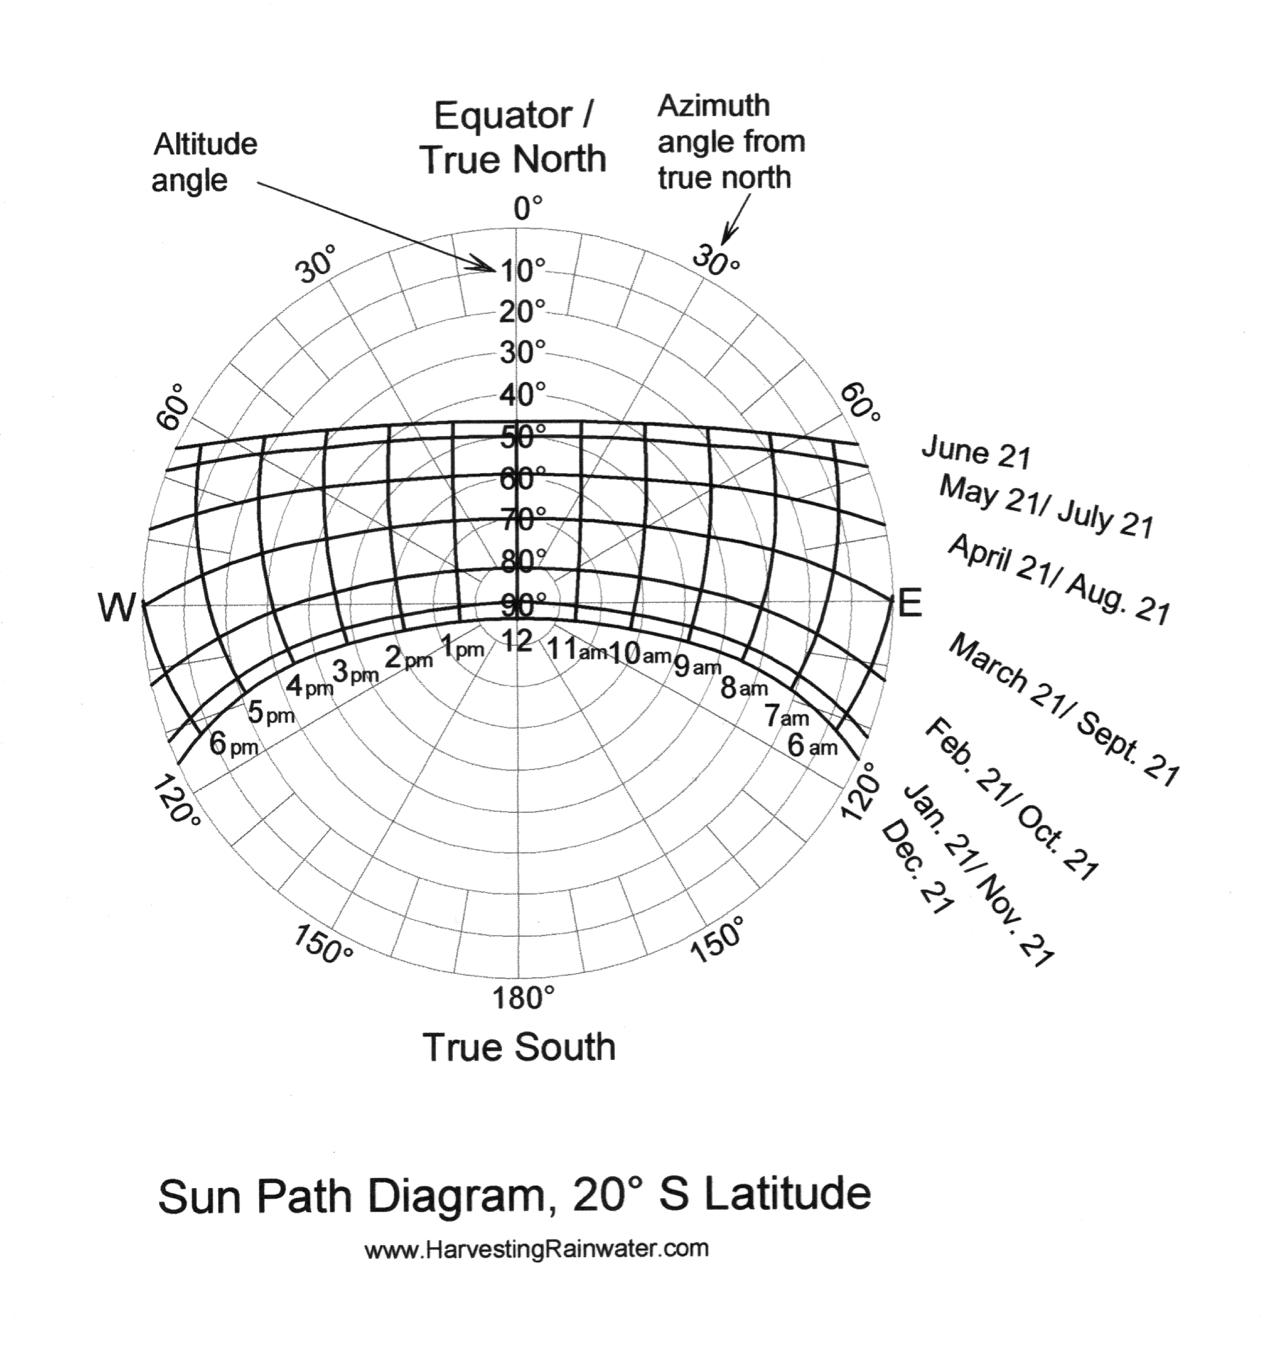 hight resolution of sun path diagram 20 s latitude